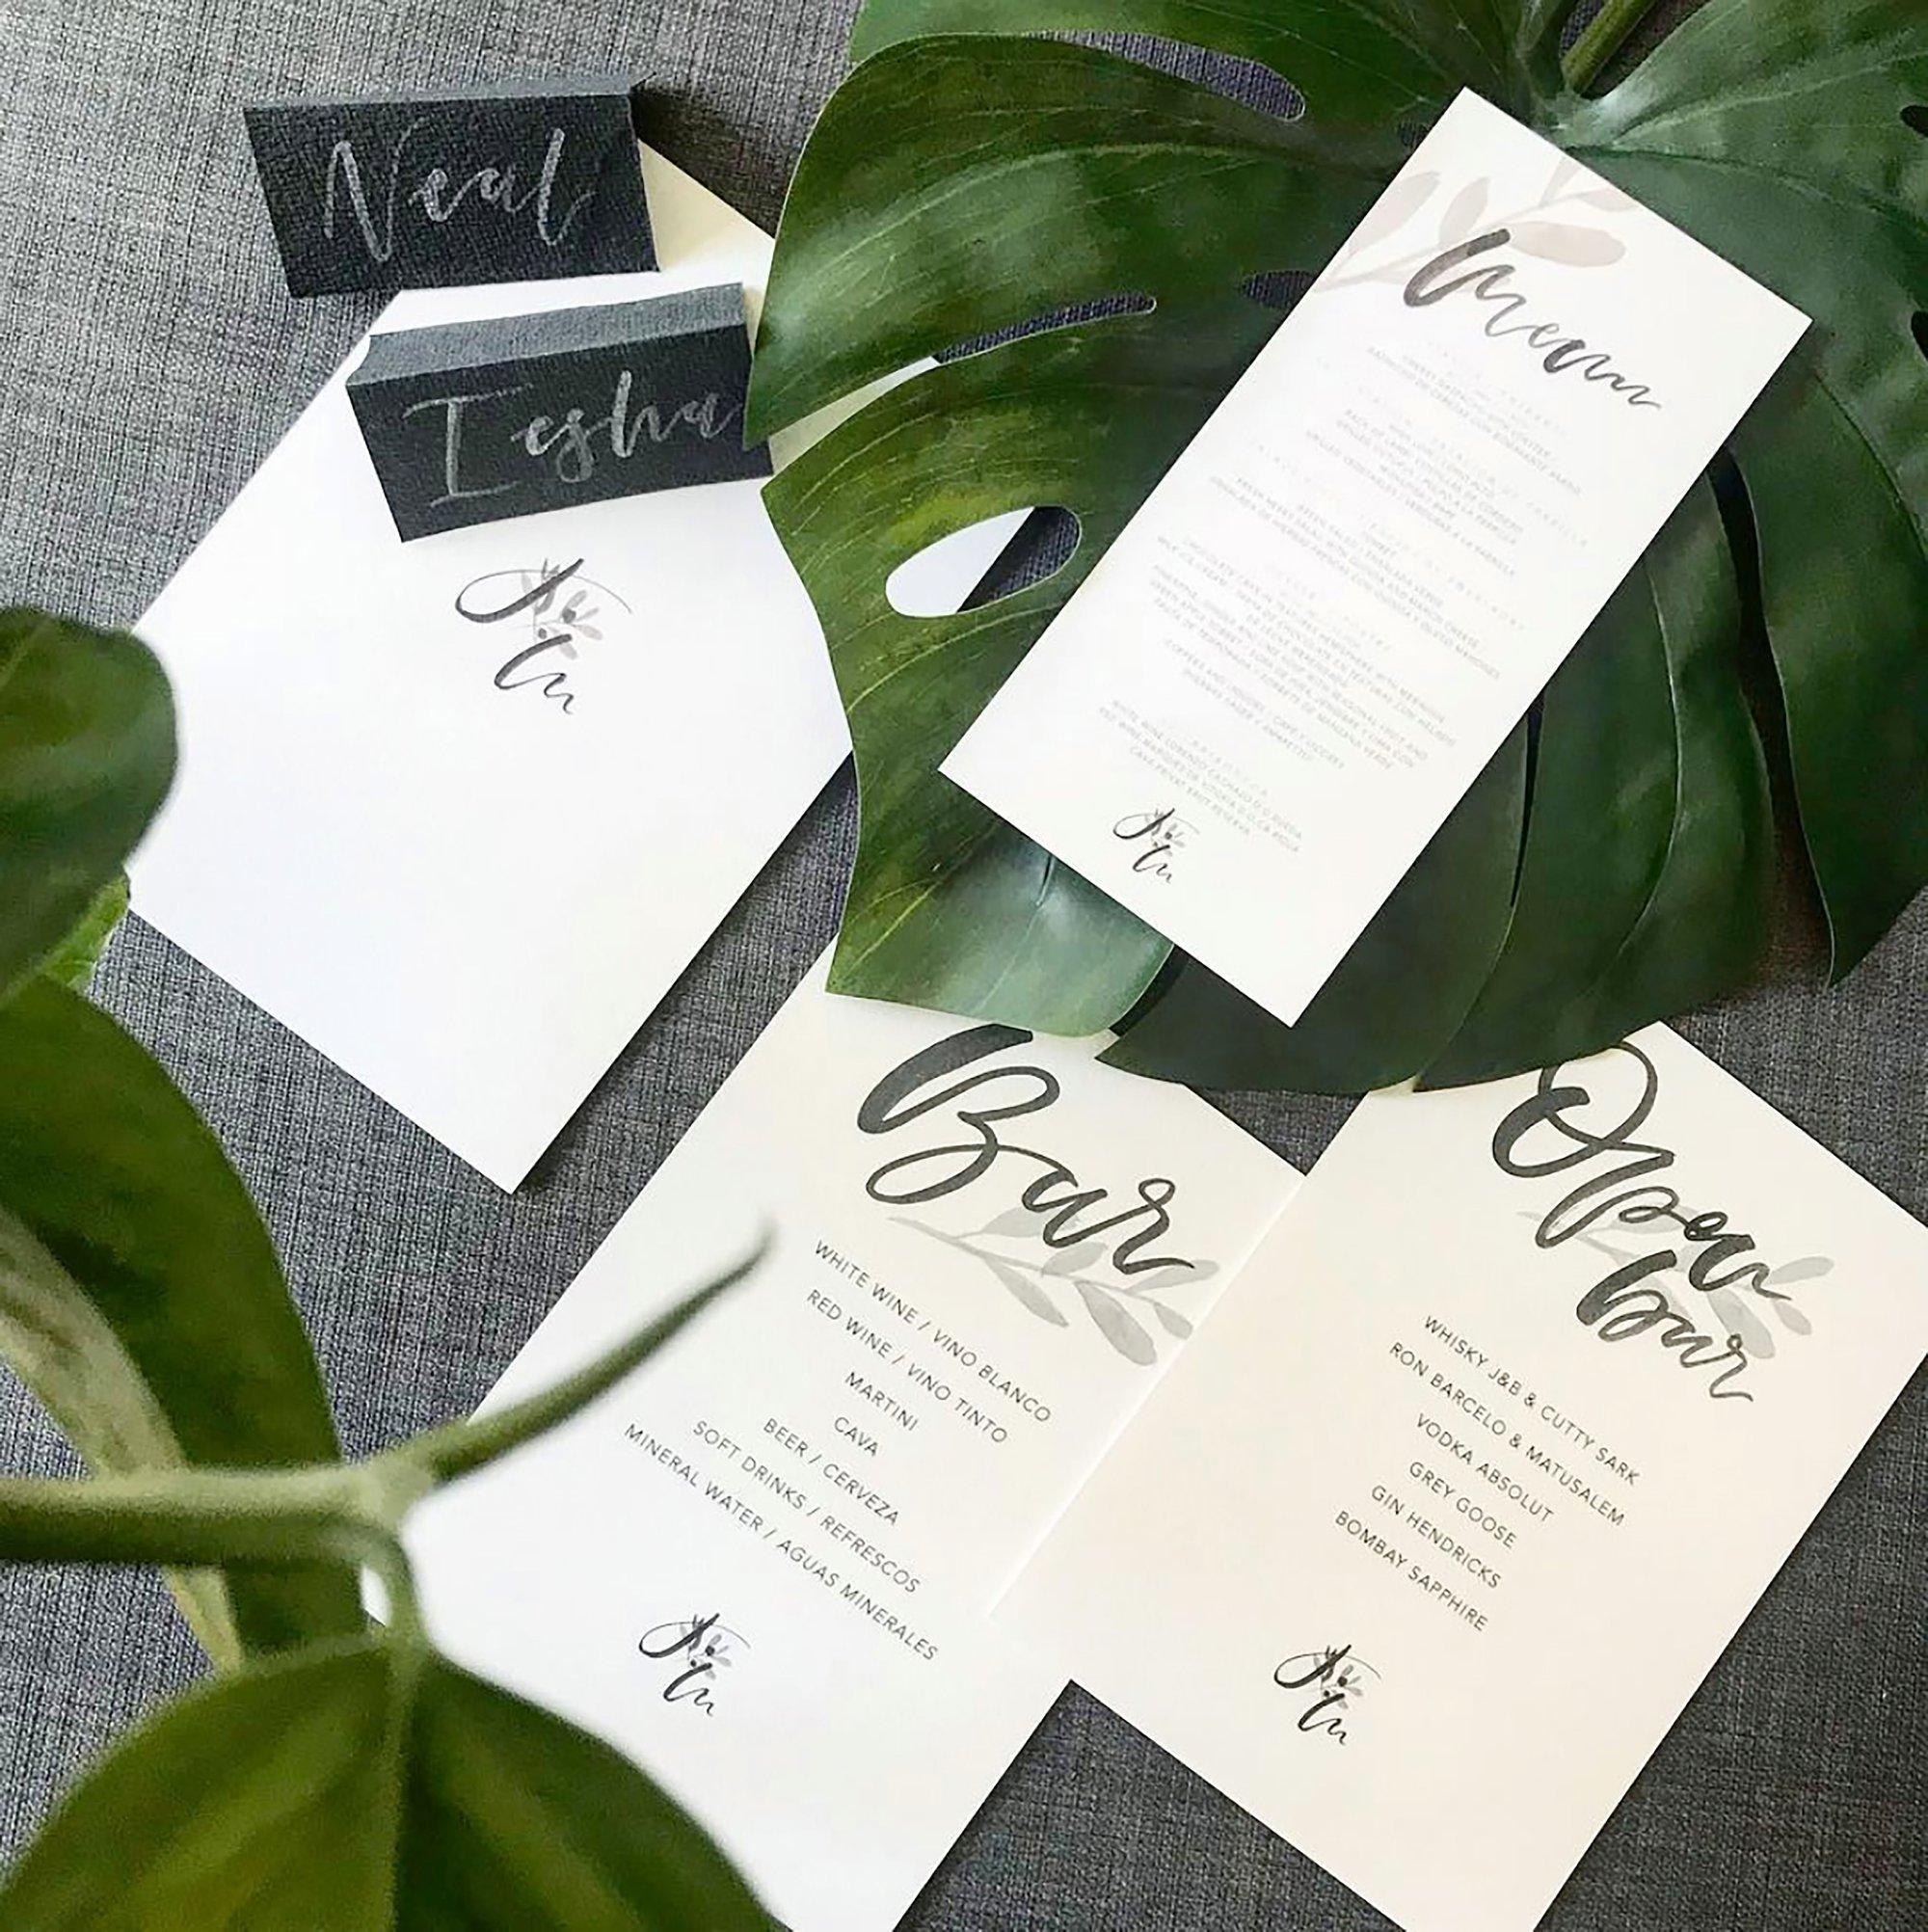 Bee Davies Illustration Floral and Geometric Handpainted wedding jackets calligraphy stationery cool bride modern weddings 00002.jpg